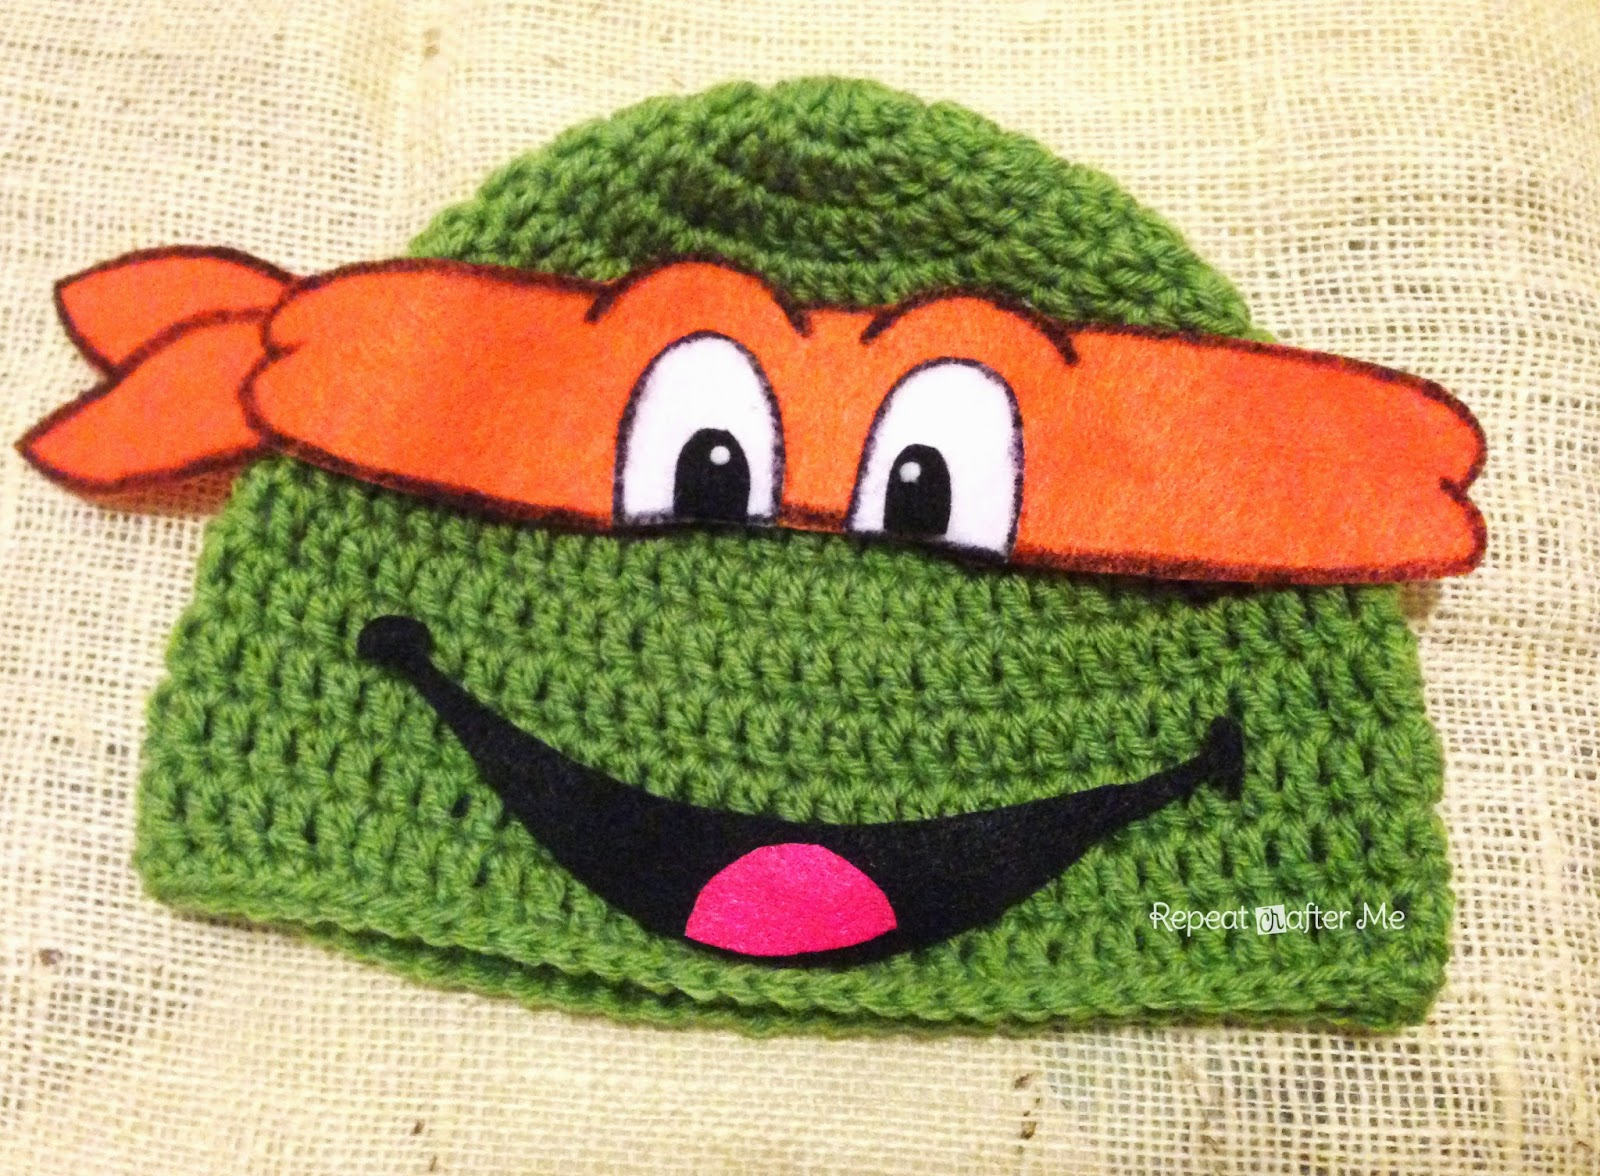 Free Crochet Pattern For Ninja Hat : Repeat Crafter Me: Crochet Ninja Turtle Hat Pattern